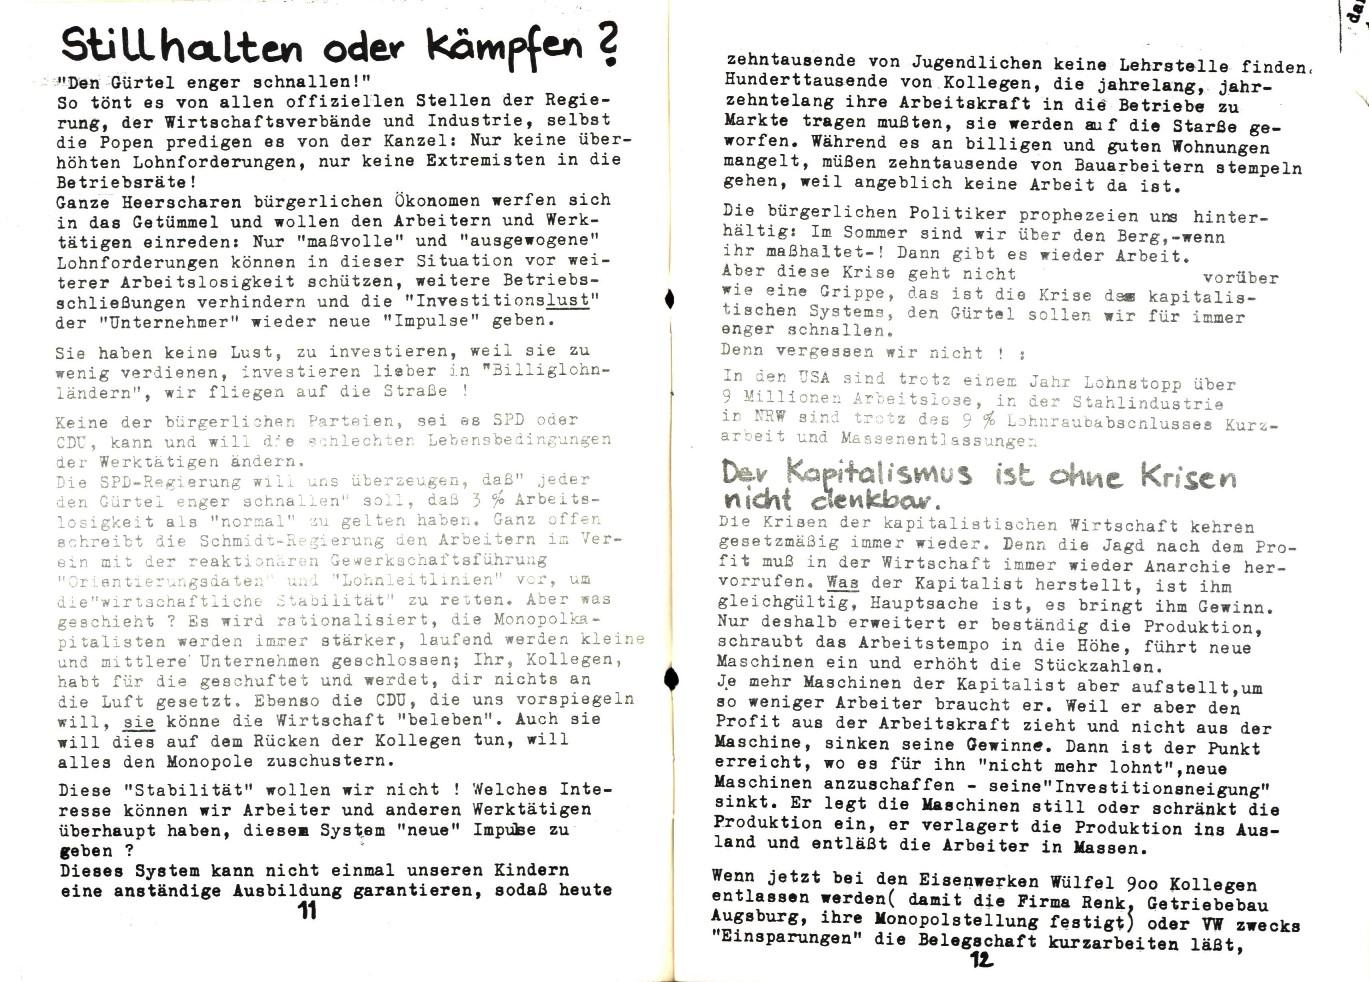 Hannover_AO_1975_Fahrpreisboykott_07